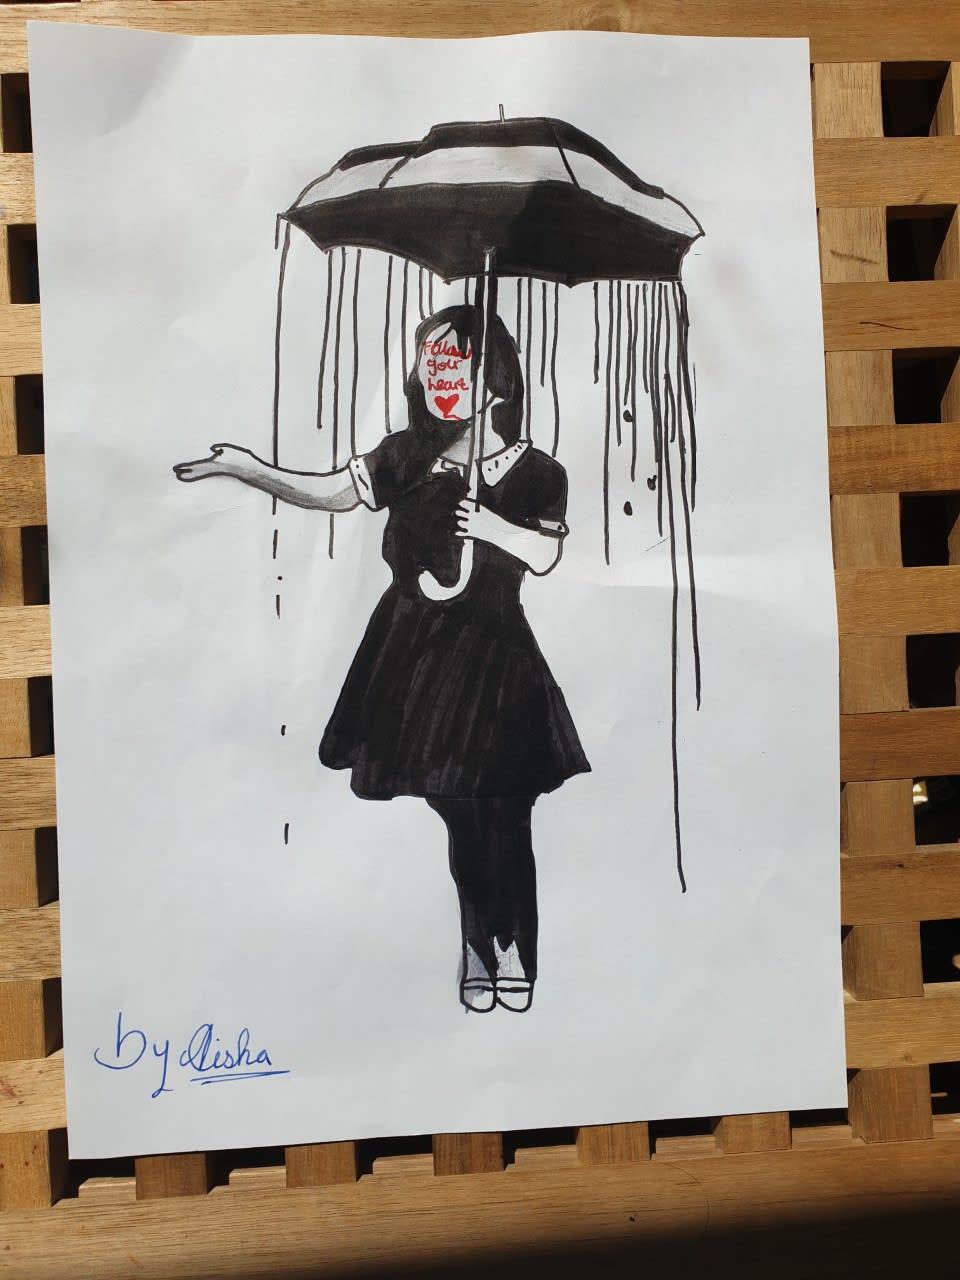 Aisha Ali, age 11 Inspired by Banksy Noel